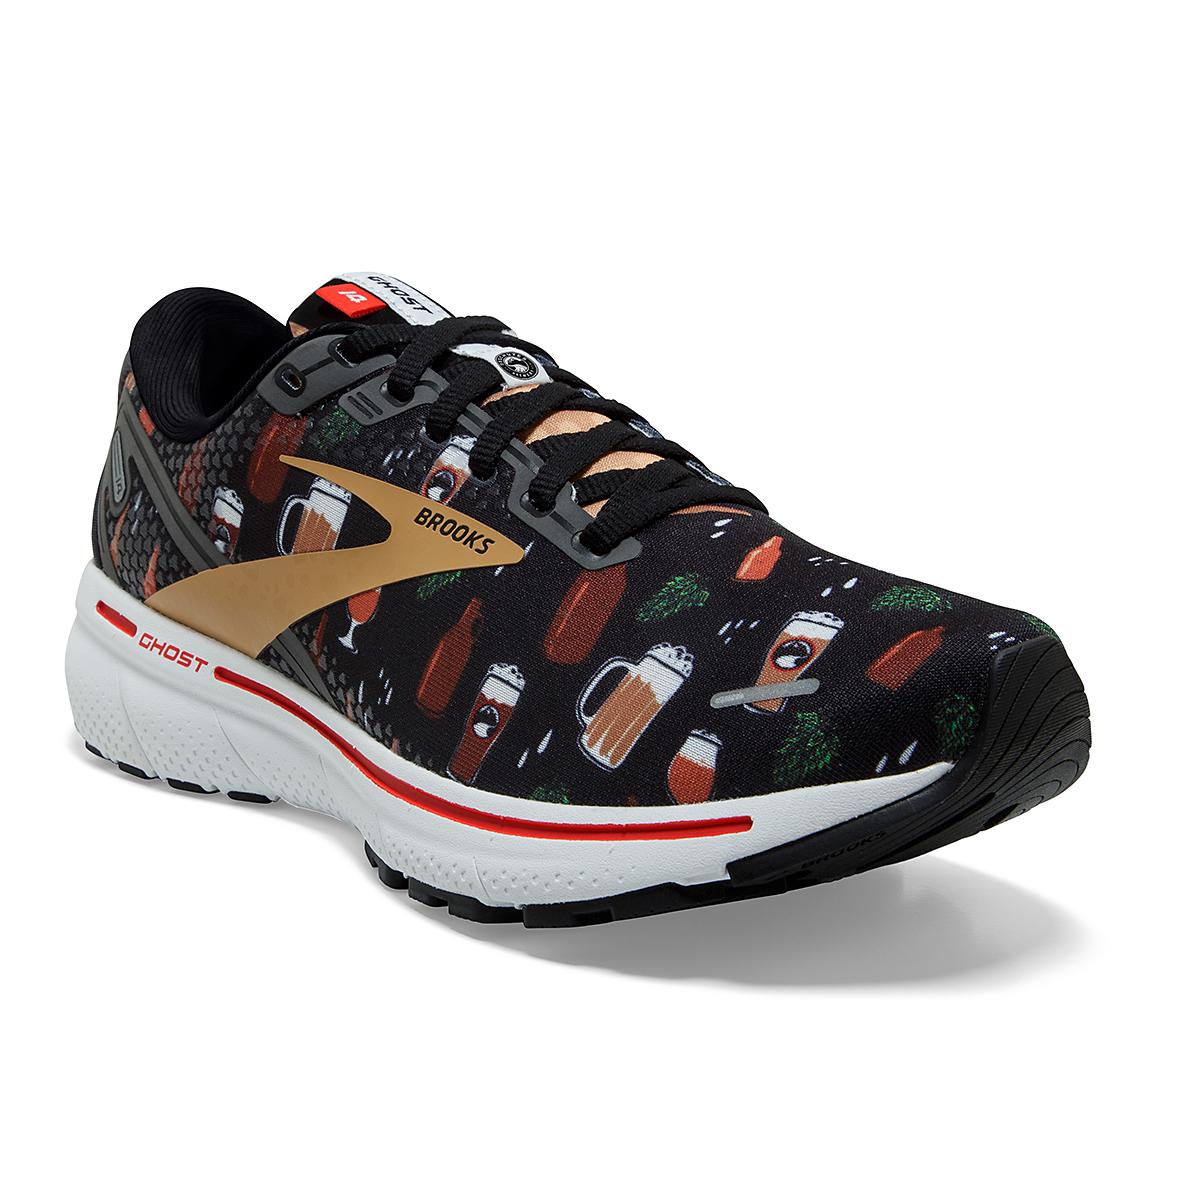 Women's Brooks Ghost 14 Running Shoe - Color: Run Hoppy - Size: 5 - Width: Regular, Run Hoppy, large, image 2